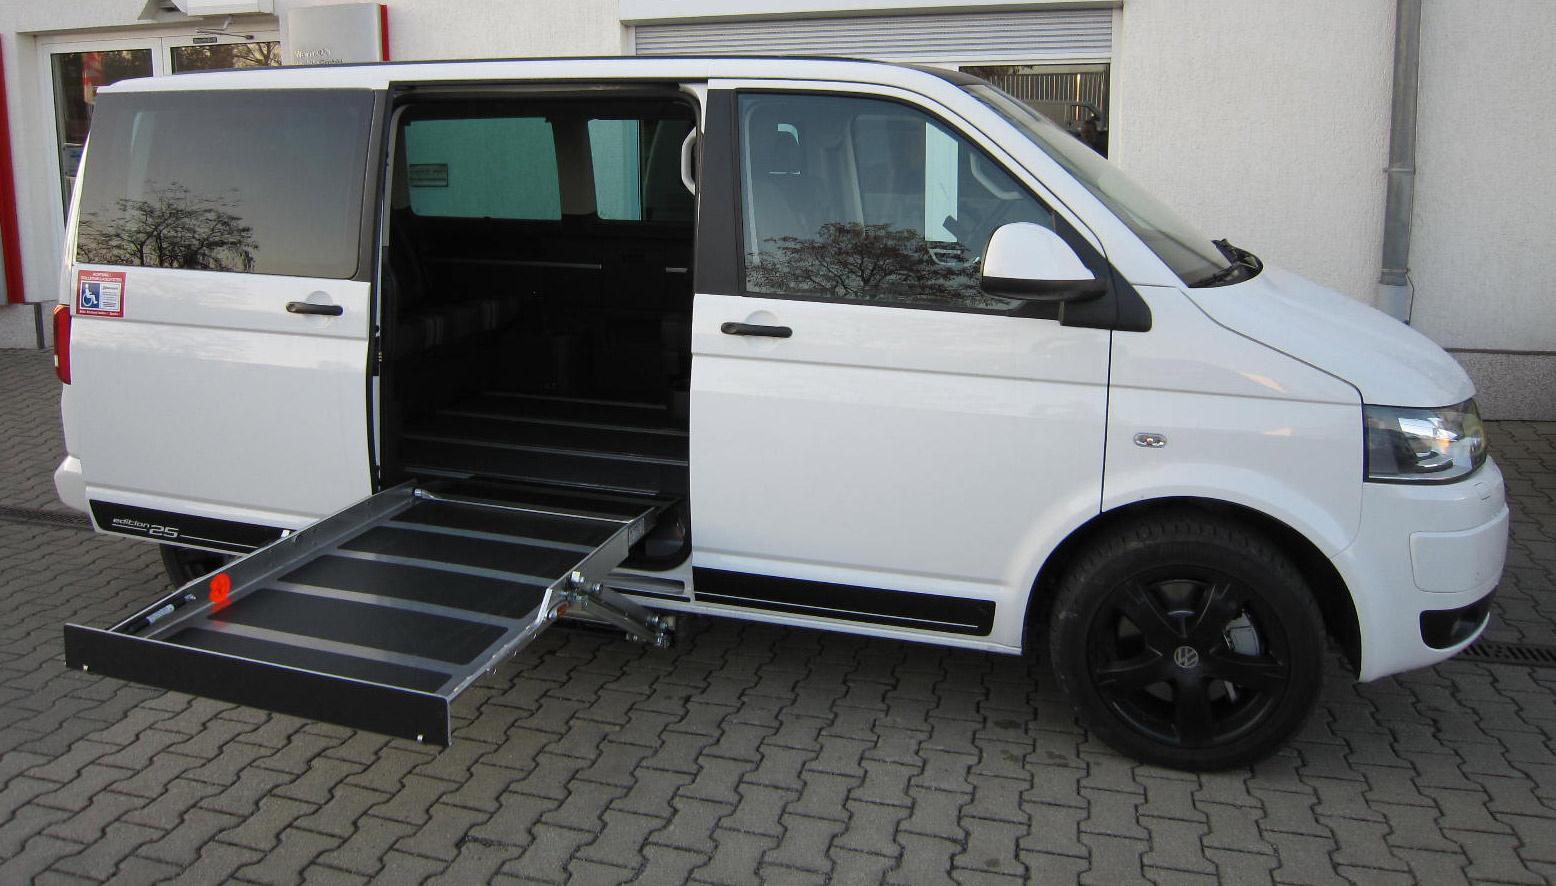 rehamobile selbstfahrer m glich vom rollstuhl in den. Black Bedroom Furniture Sets. Home Design Ideas